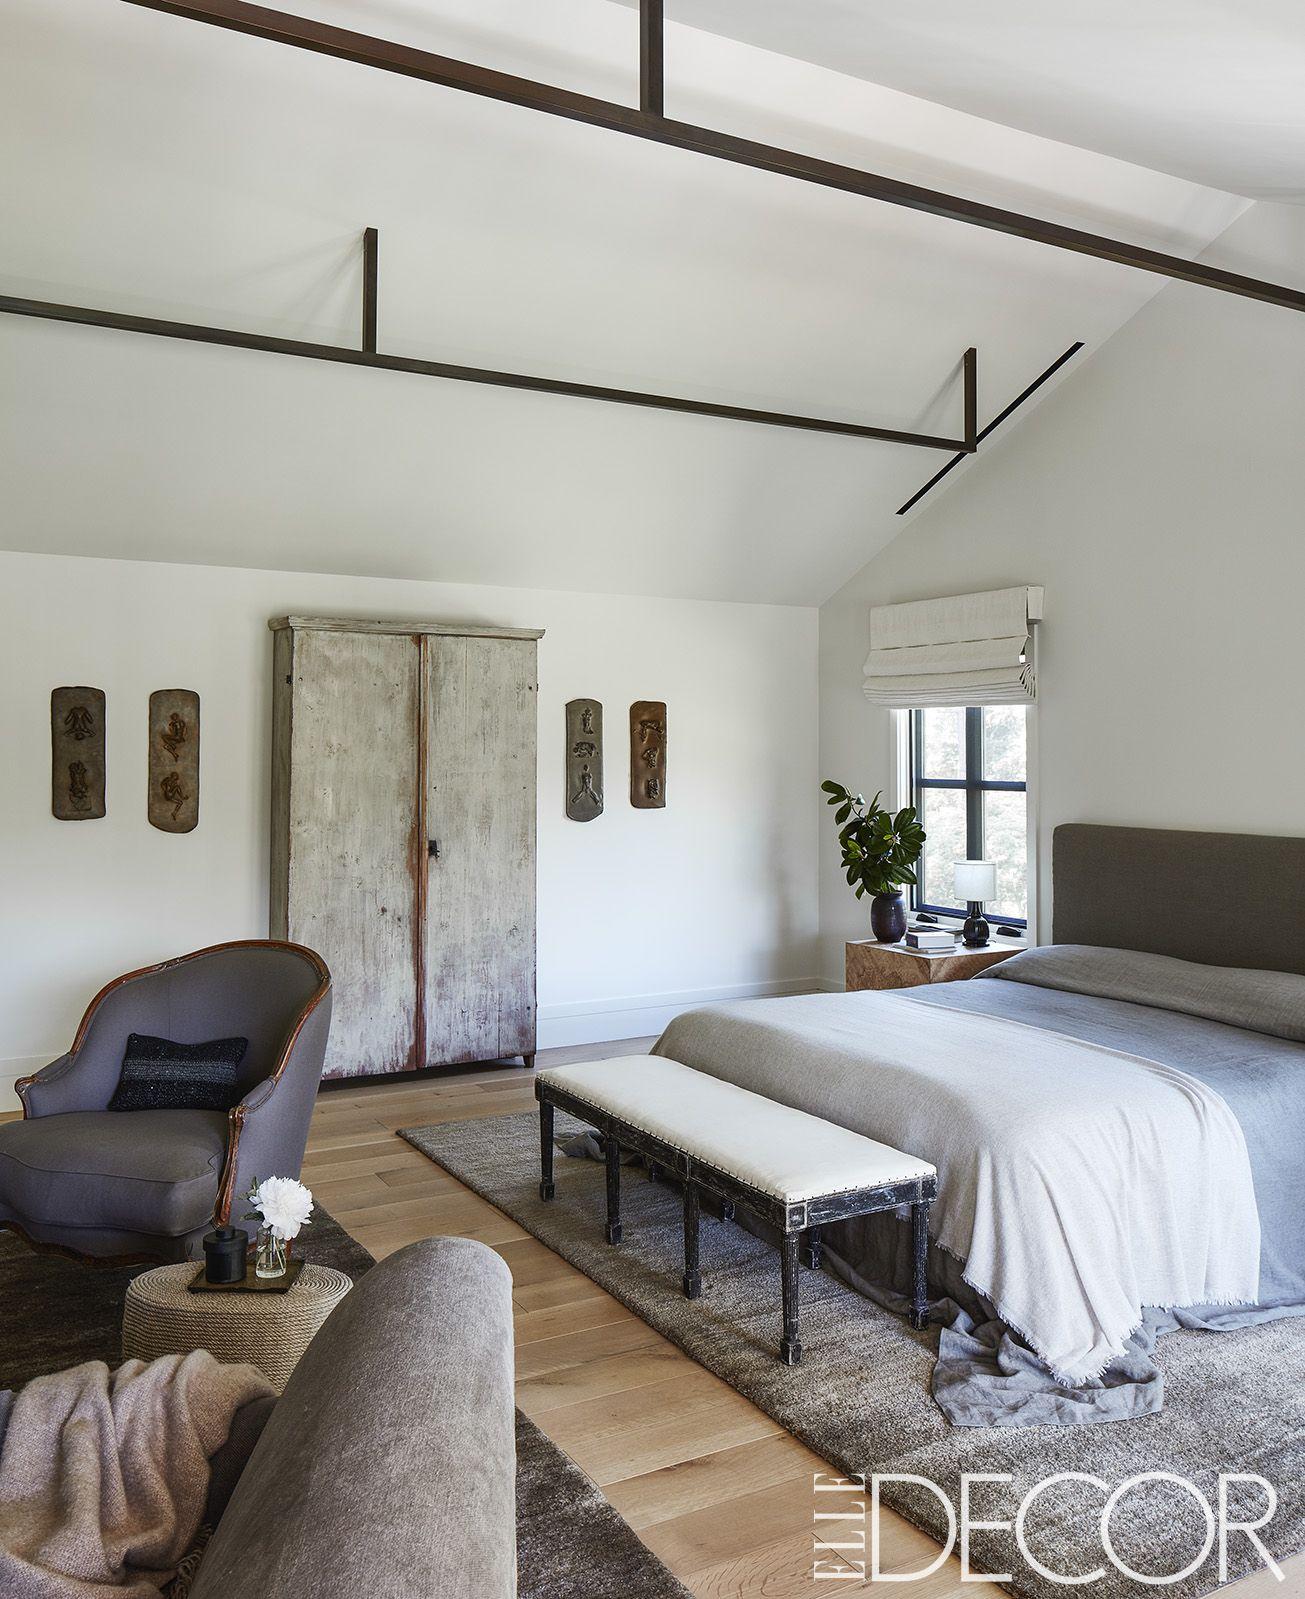 30 Minimalist Bedroom Decor Ideas Modern Designs For